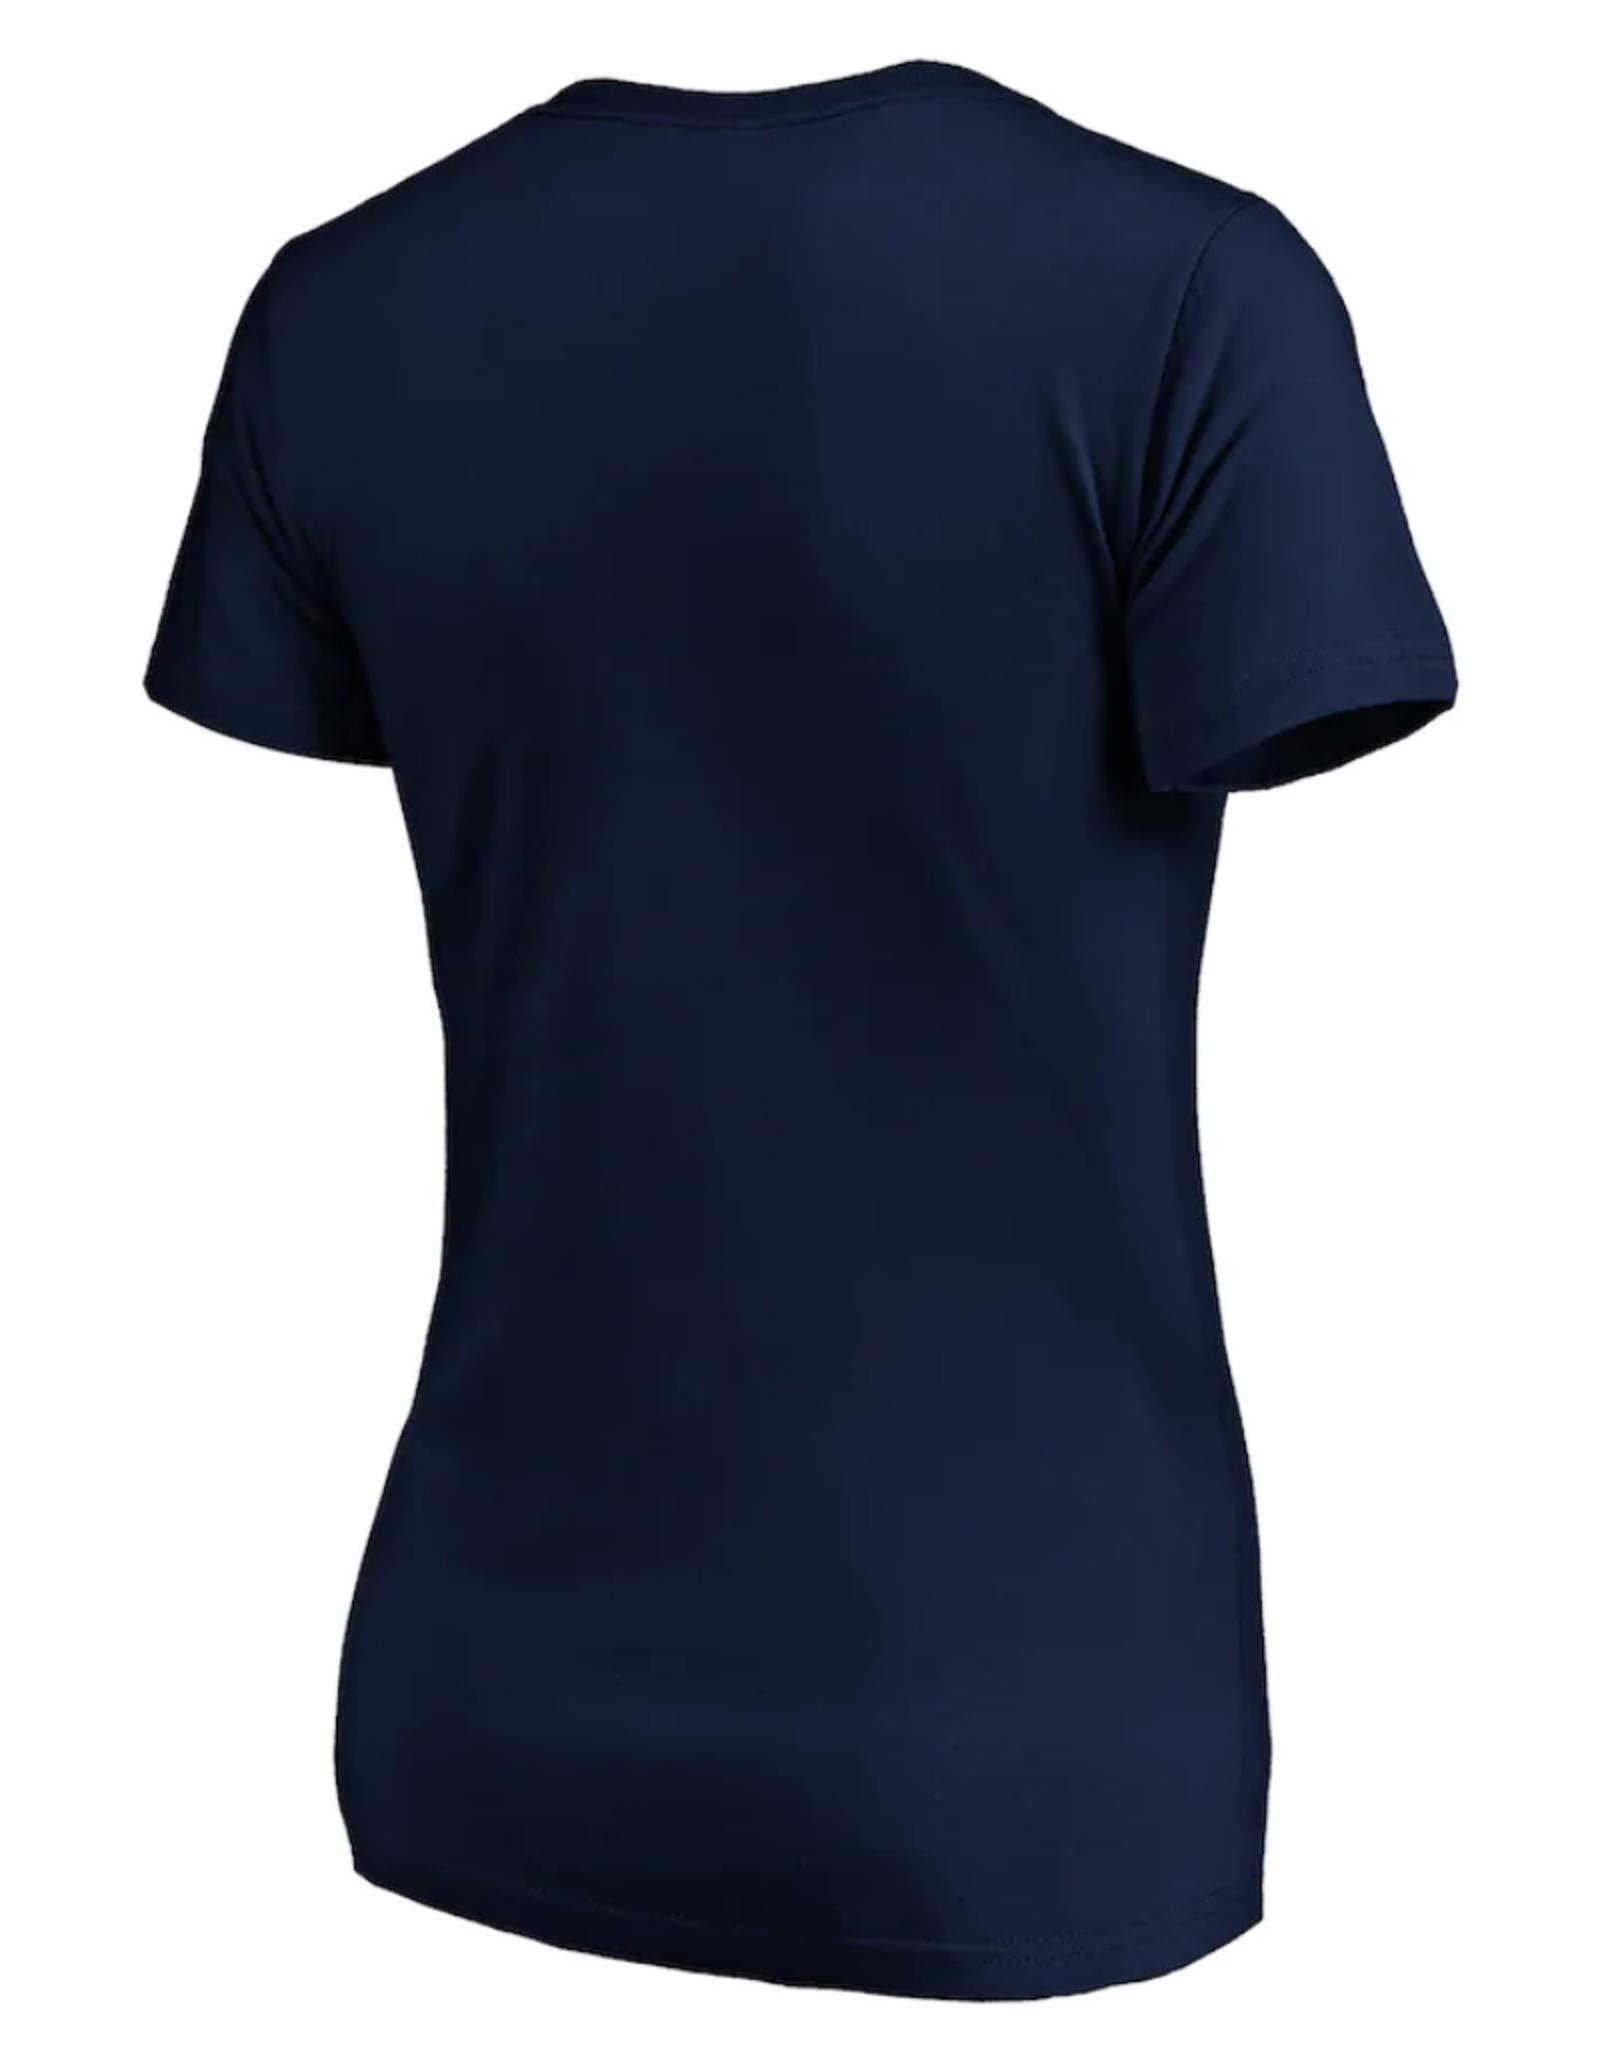 '47 Women's Imprint Ultra Rival T-shirt Toronto Maple Leafs Navy